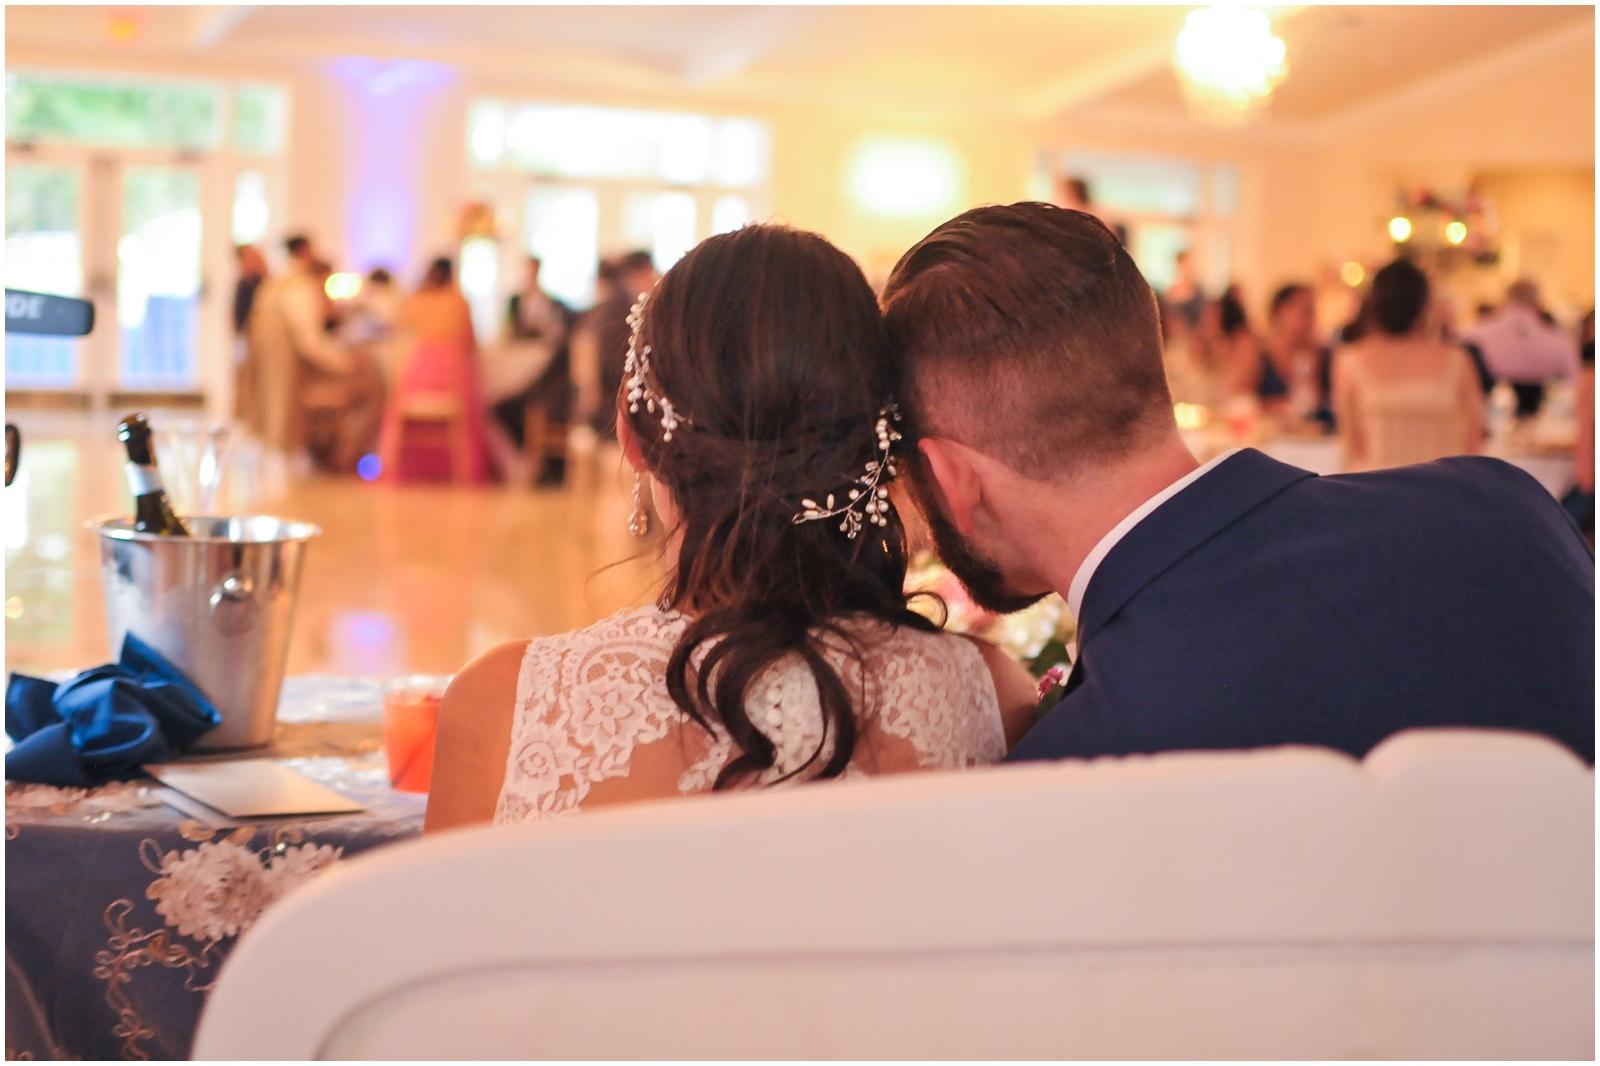 Rustic-Elegant-Wedding-Venue-in-Tampa-Stonebridge-Events_0448.jpg